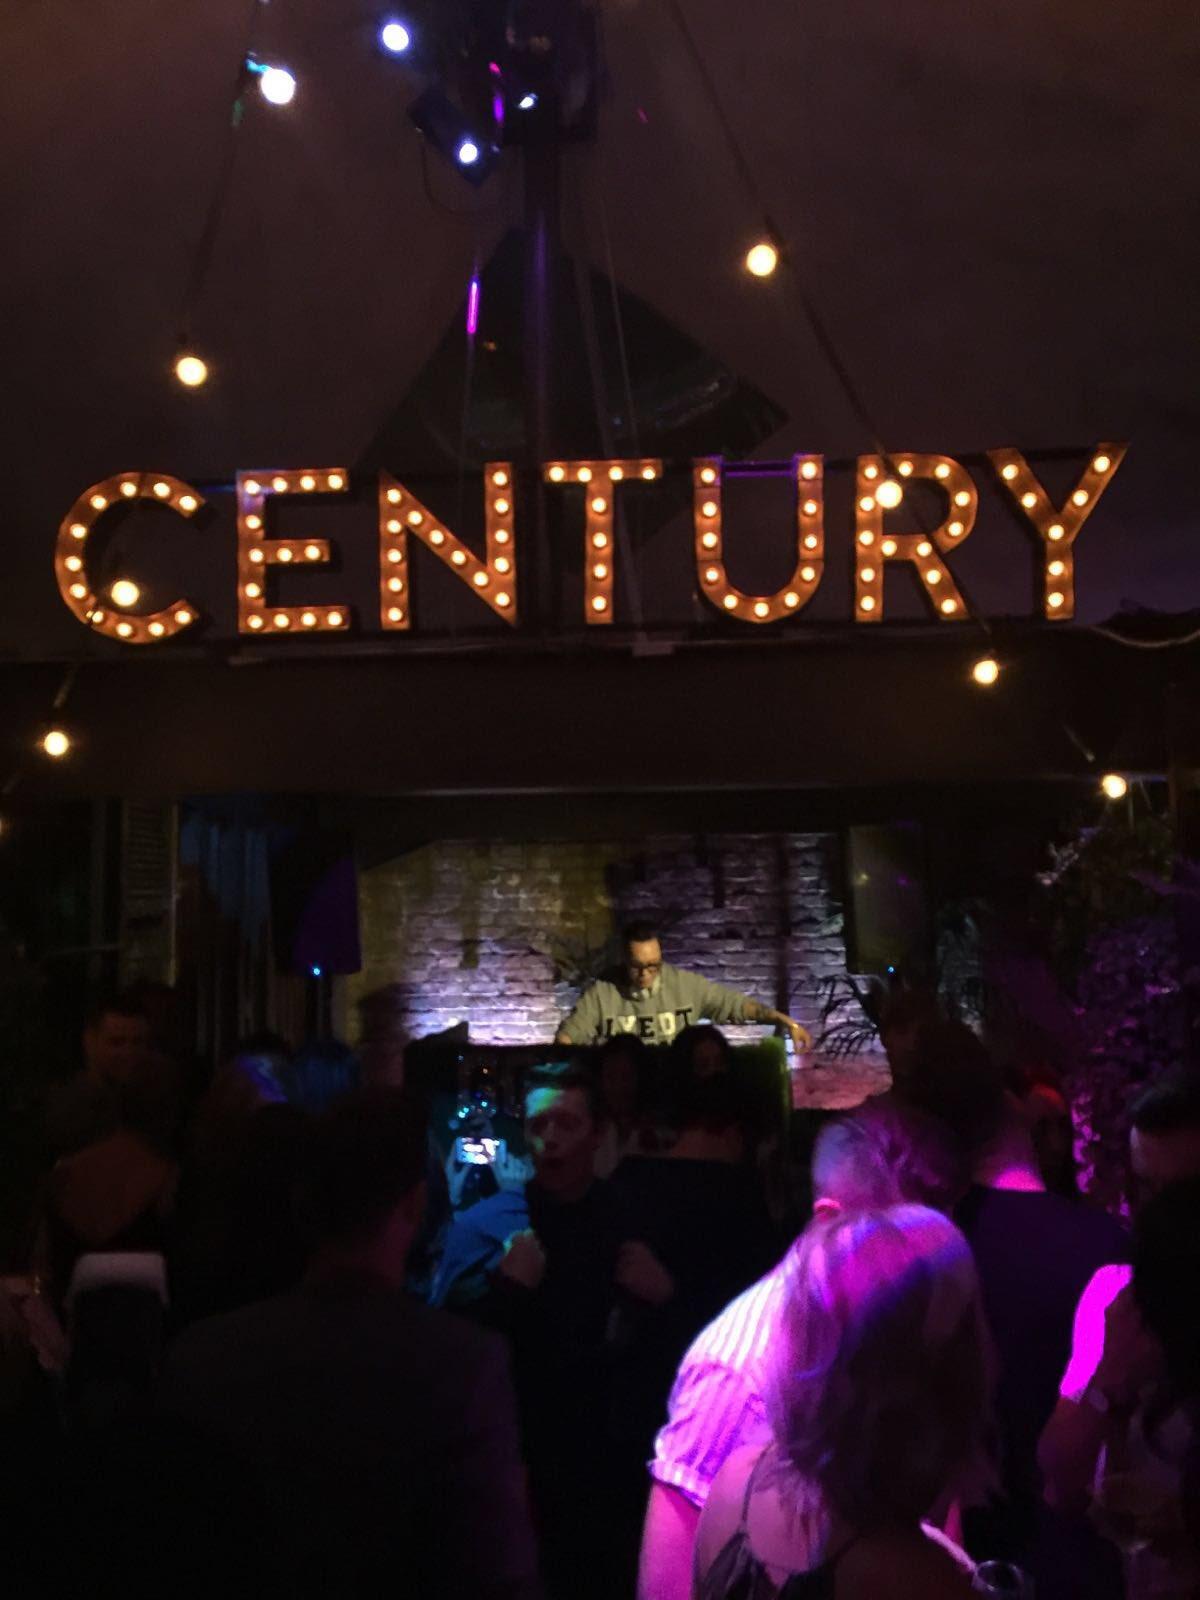 About last night! Thanks @CenturySoho for having me! Loved my debut DJ set! X https://t.co/Xec0oneJXm